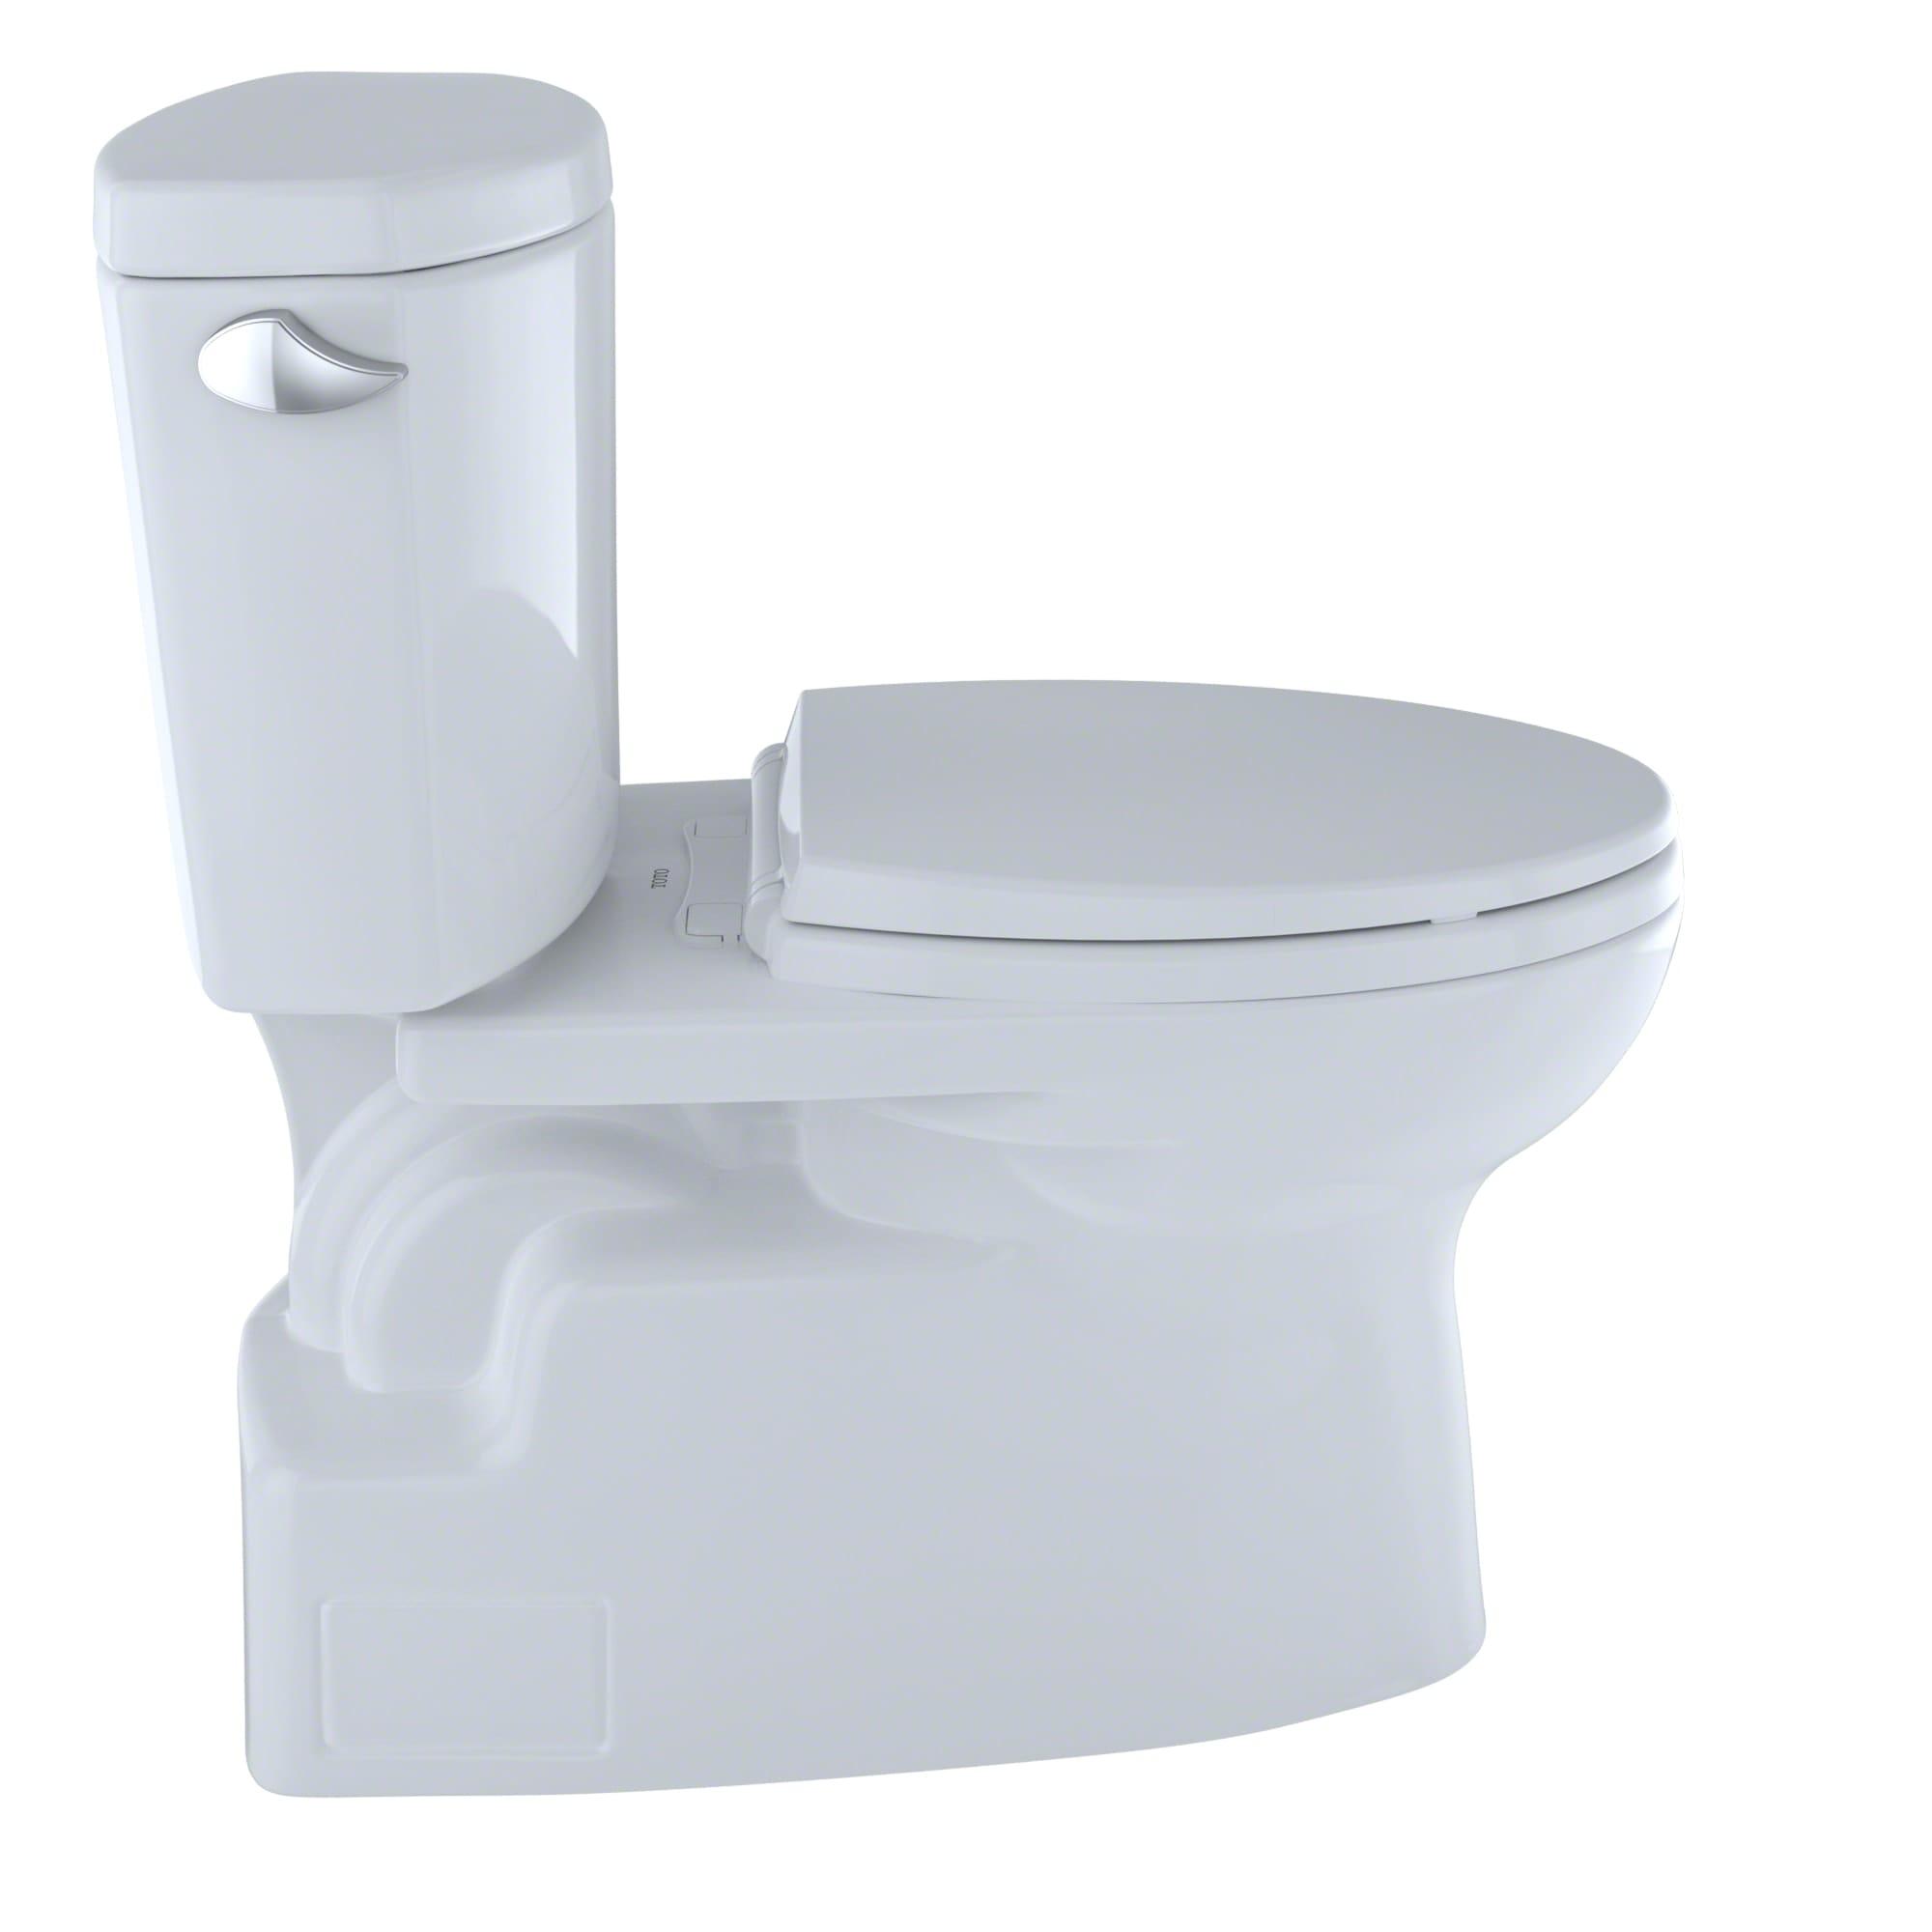 Round Shower Base Used As Kitchen Sink